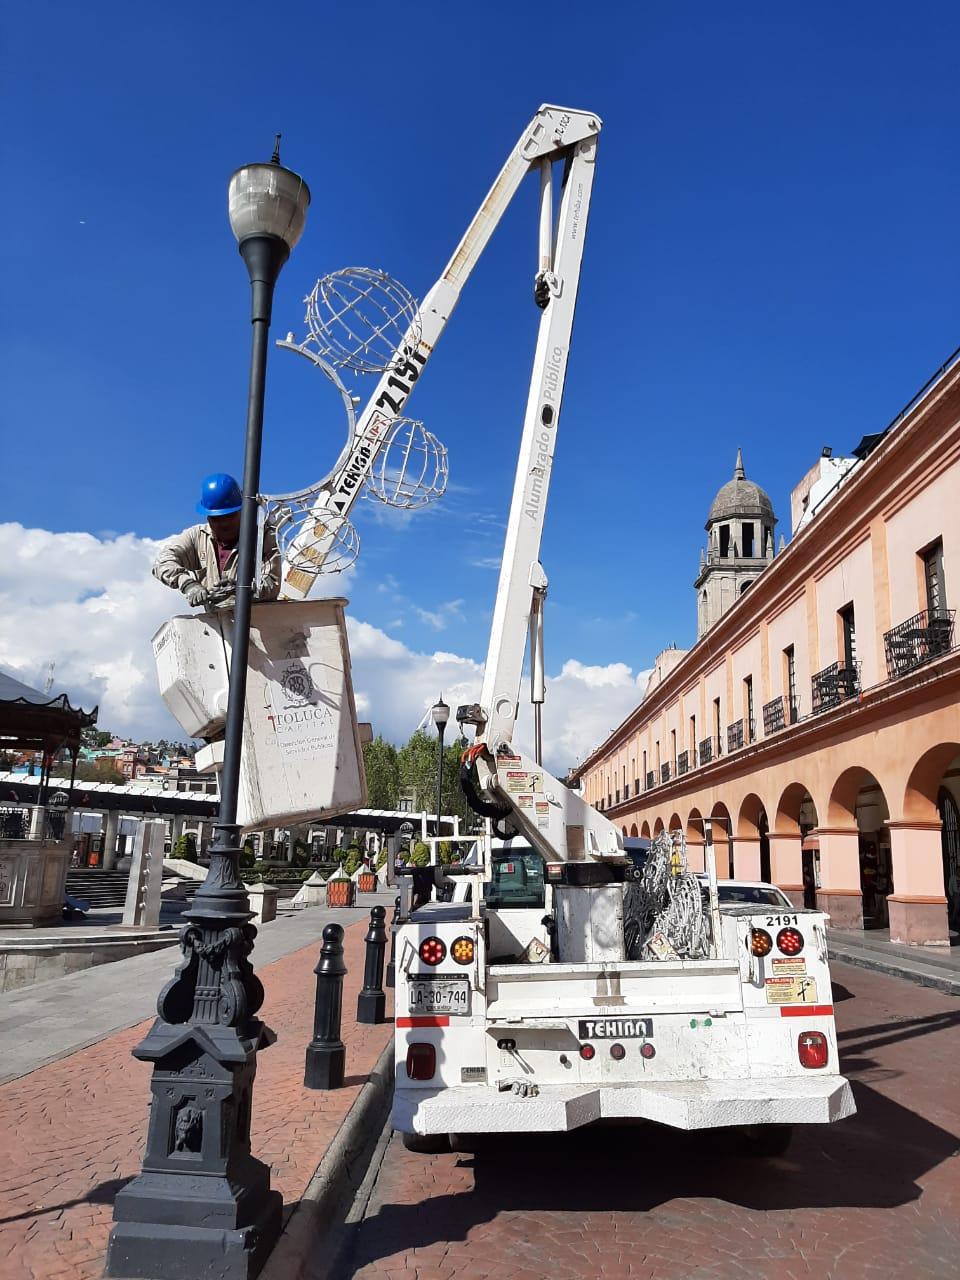 Espíritu navideño llega a calles y plazas de Toluca